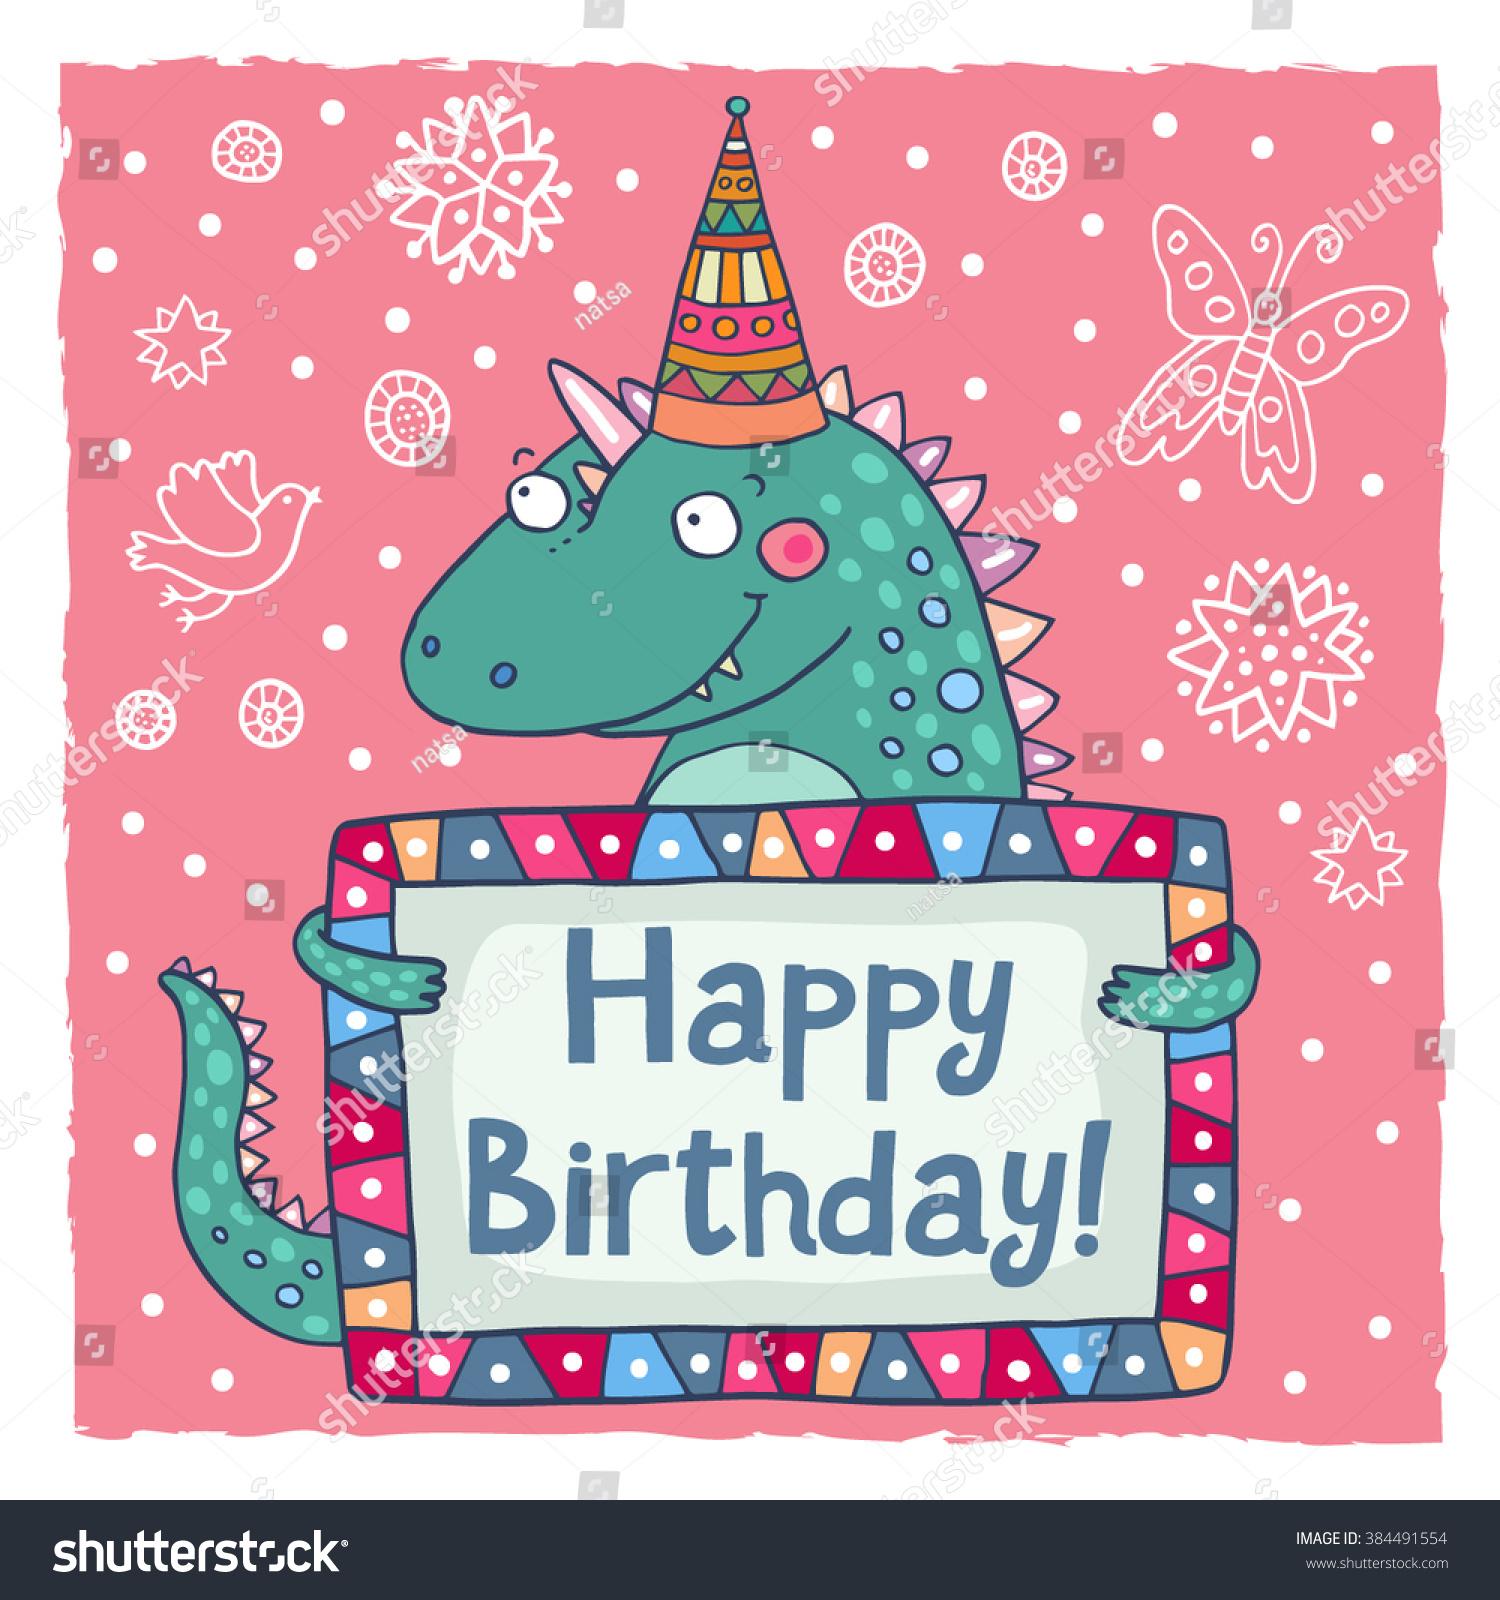 Cute Happy Birthday Greeting Card Template With A Cartoon Dino – Happy Birthday Word Template